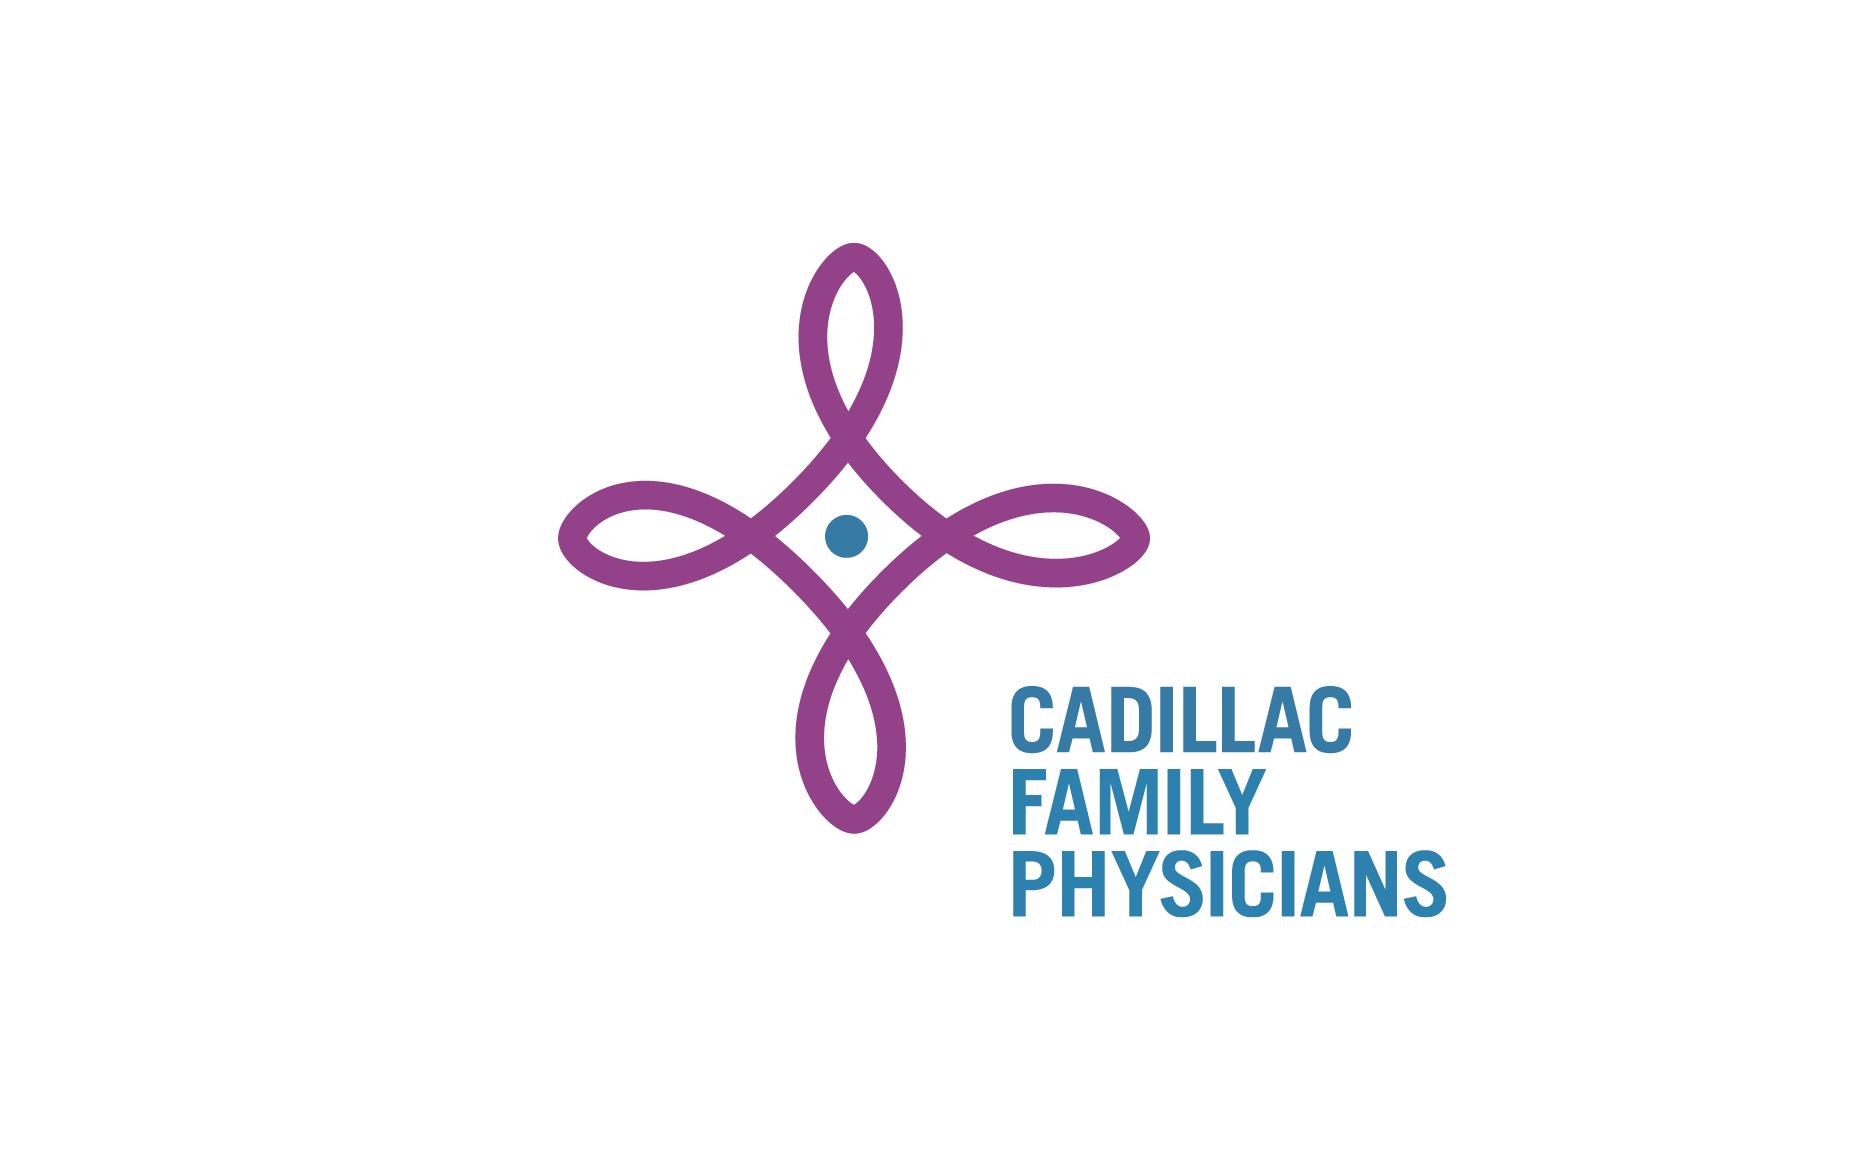 Cadillac Family Physicians Aj Papin